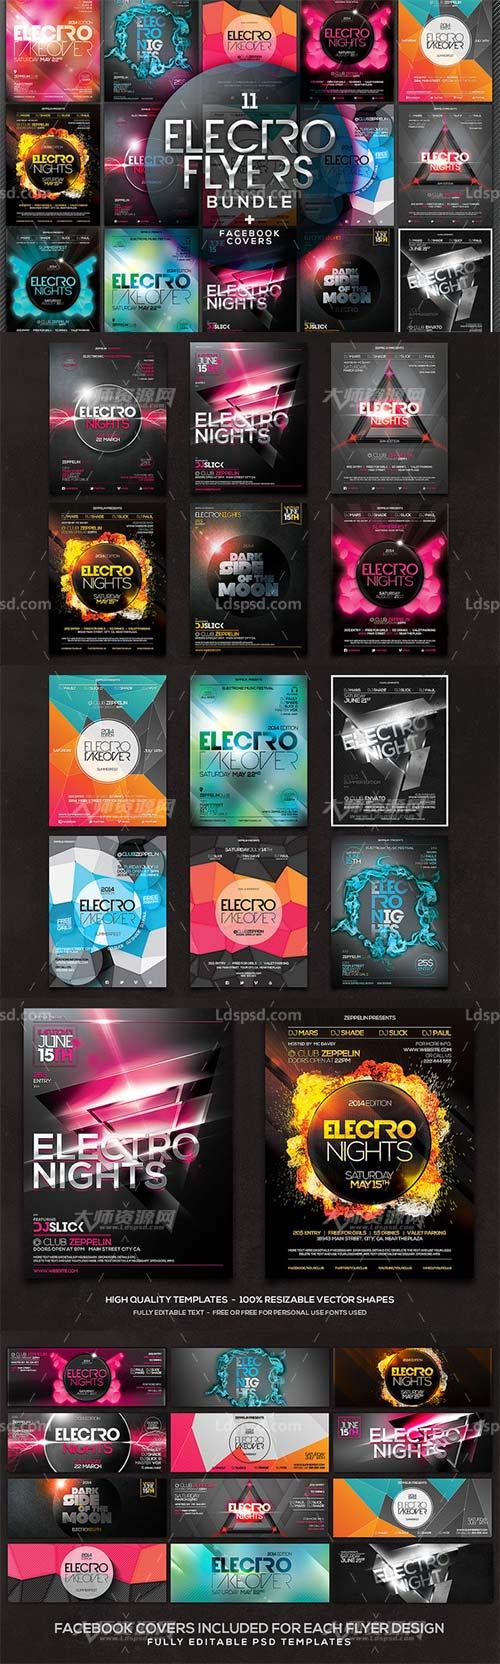 Electro Flyers Bundle + FB Covers,11组既个性又艺术的海报/传单模板